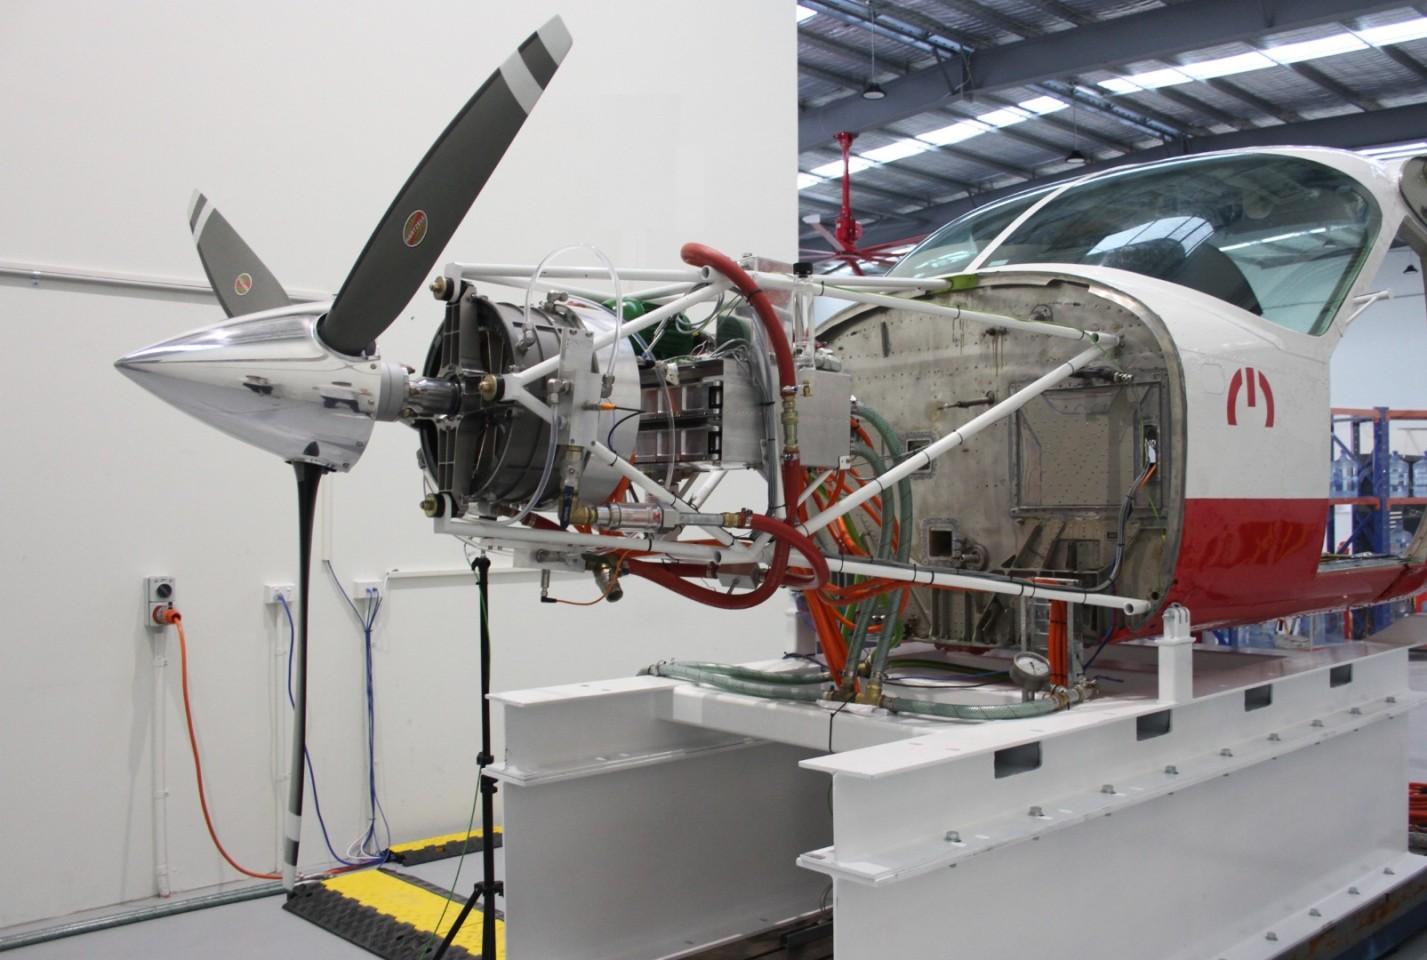 Magnix's magni500 propulsion system